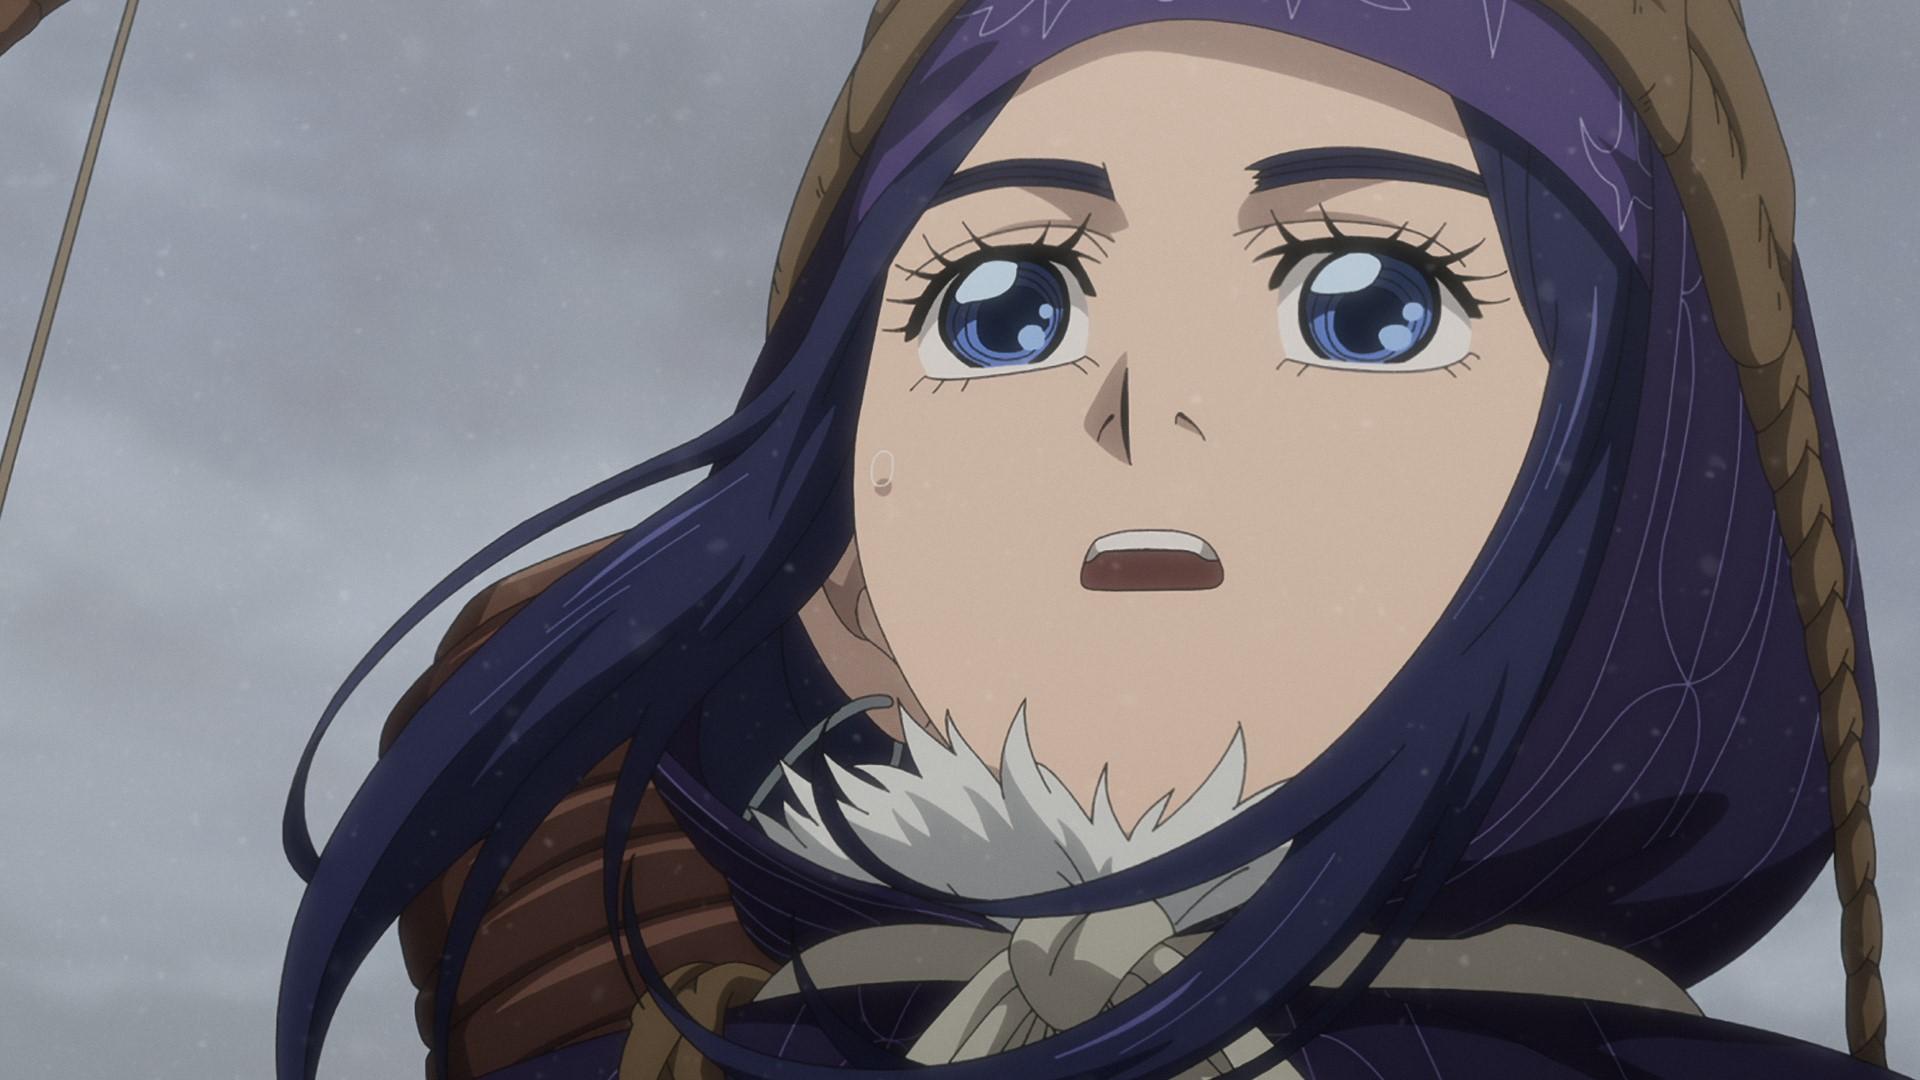 TVアニメ「ゴールデンカムイ」第三十四話「狼に追いつく」あらすじ&先行カット到着!ソフィアの脱獄開始